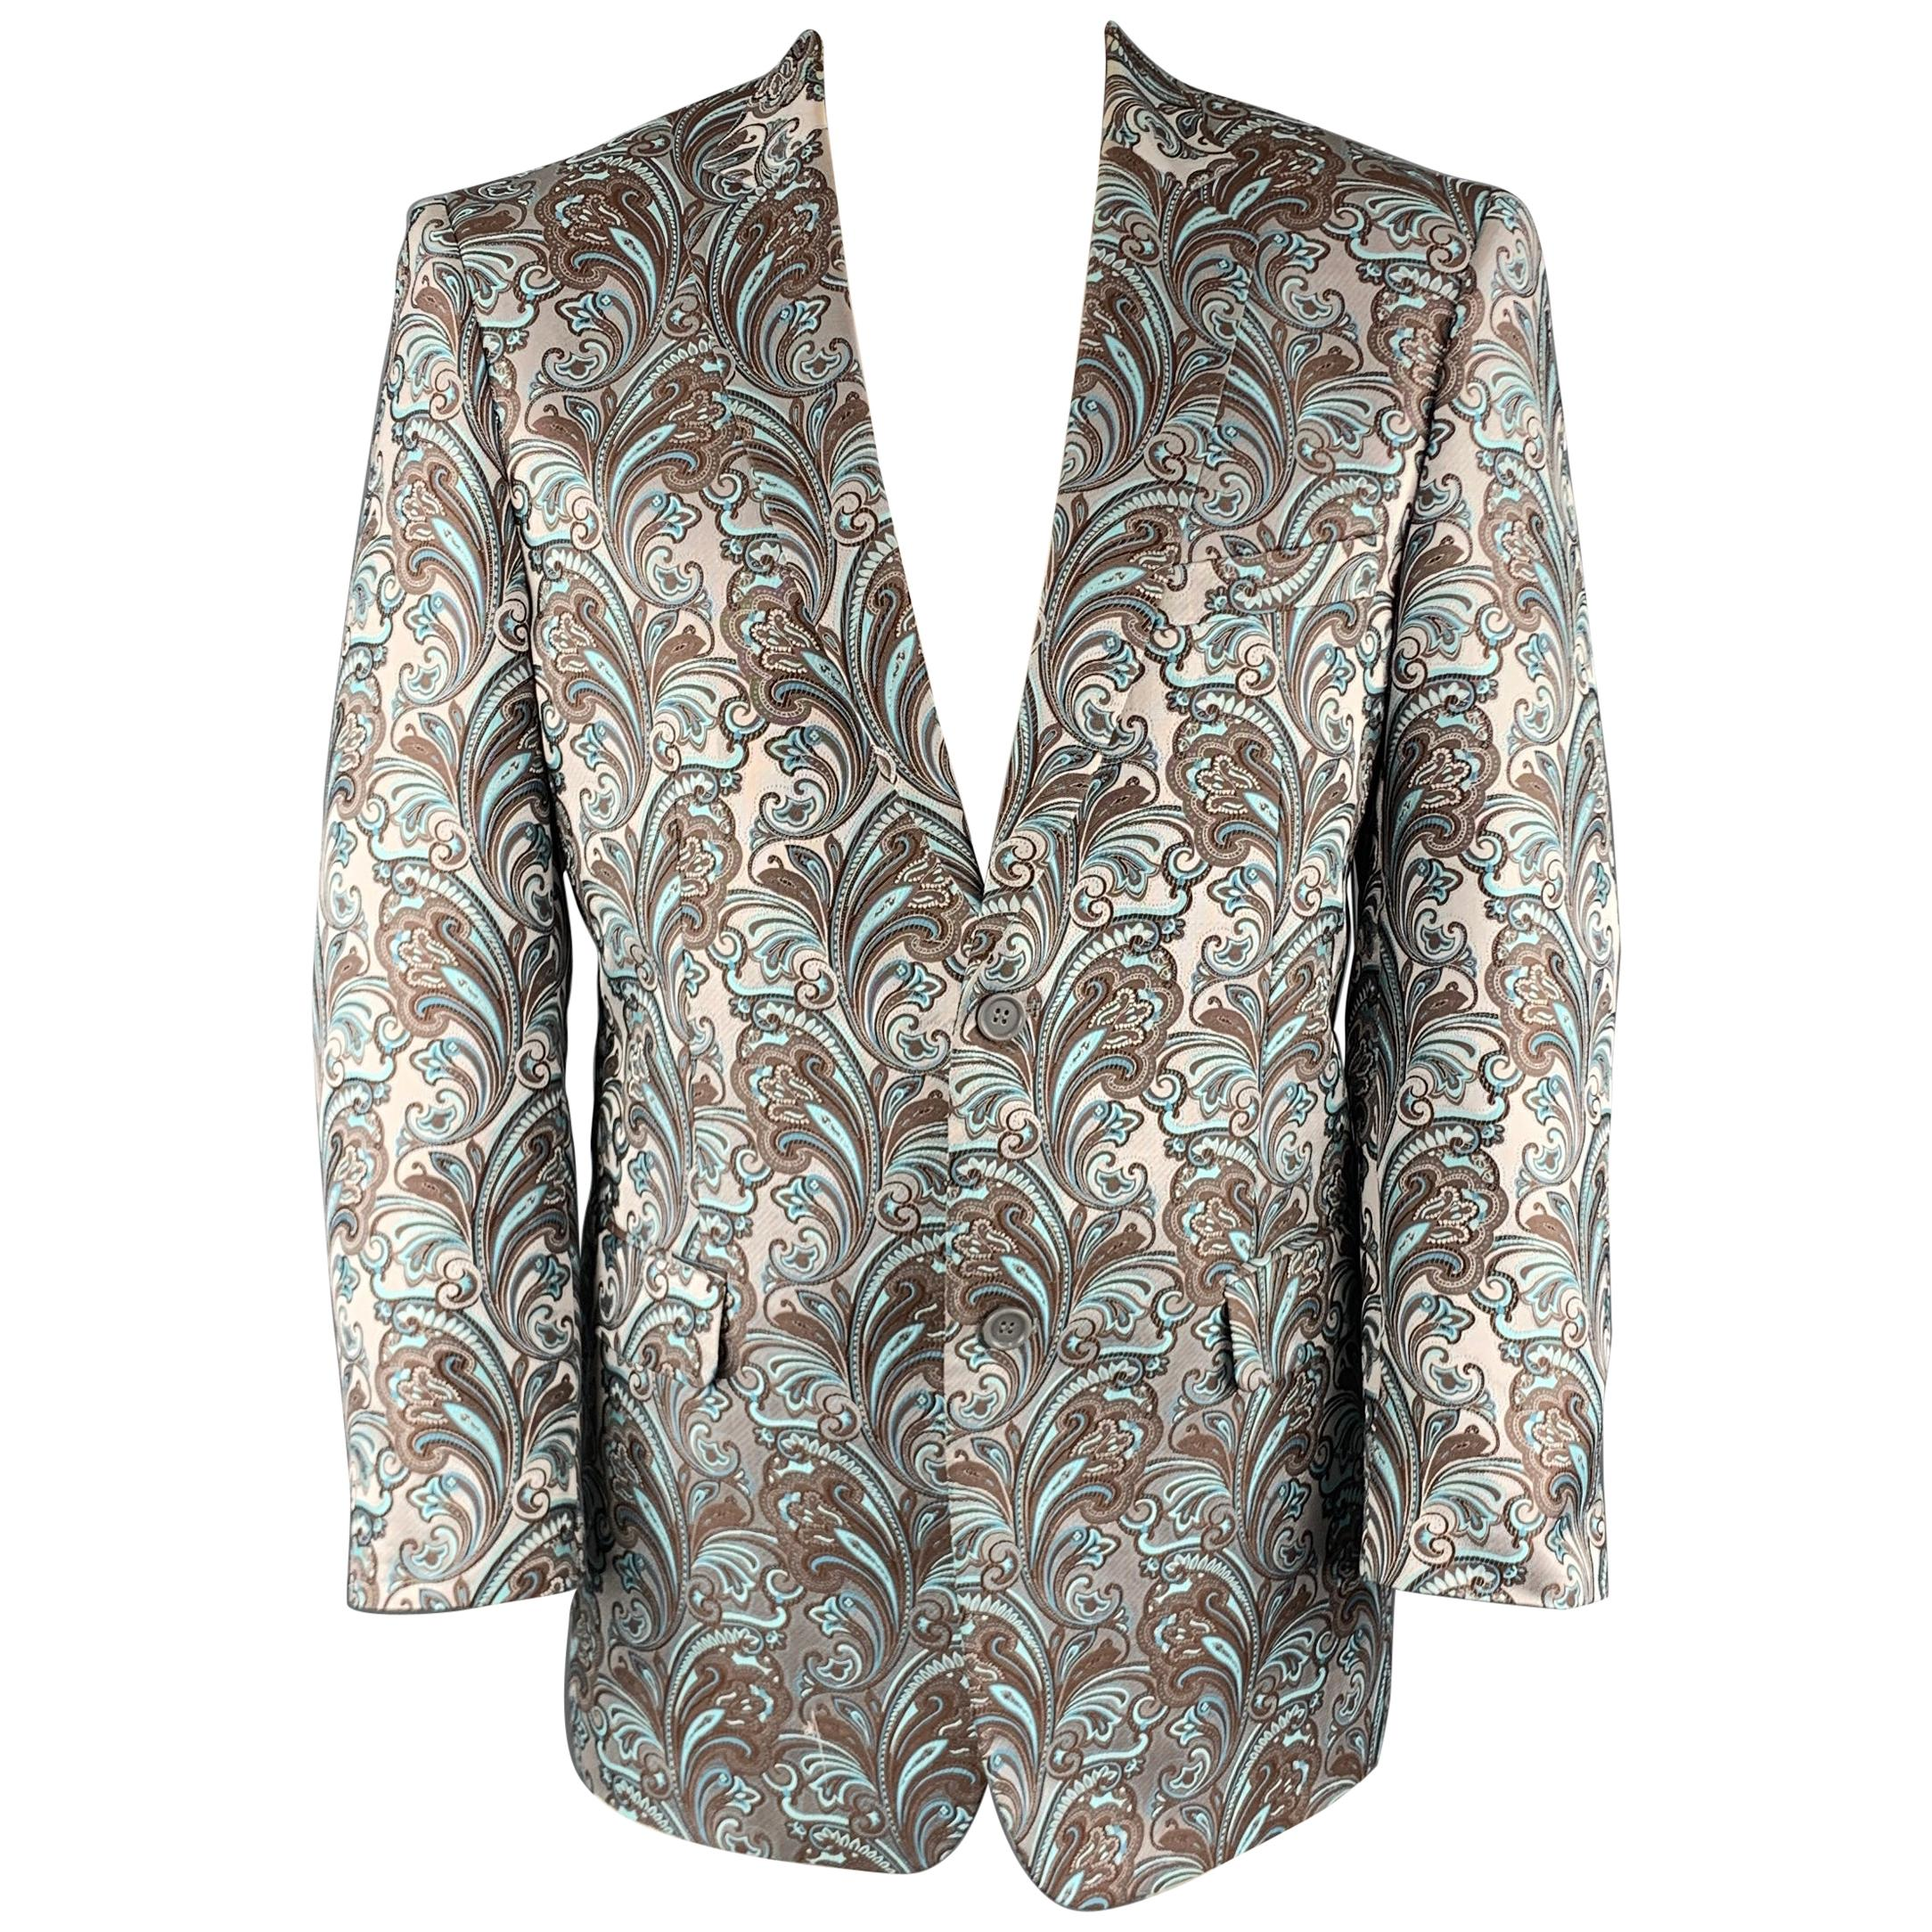 e81586ab5 Paisley Jackets - 40 For Sale on 1stdibs